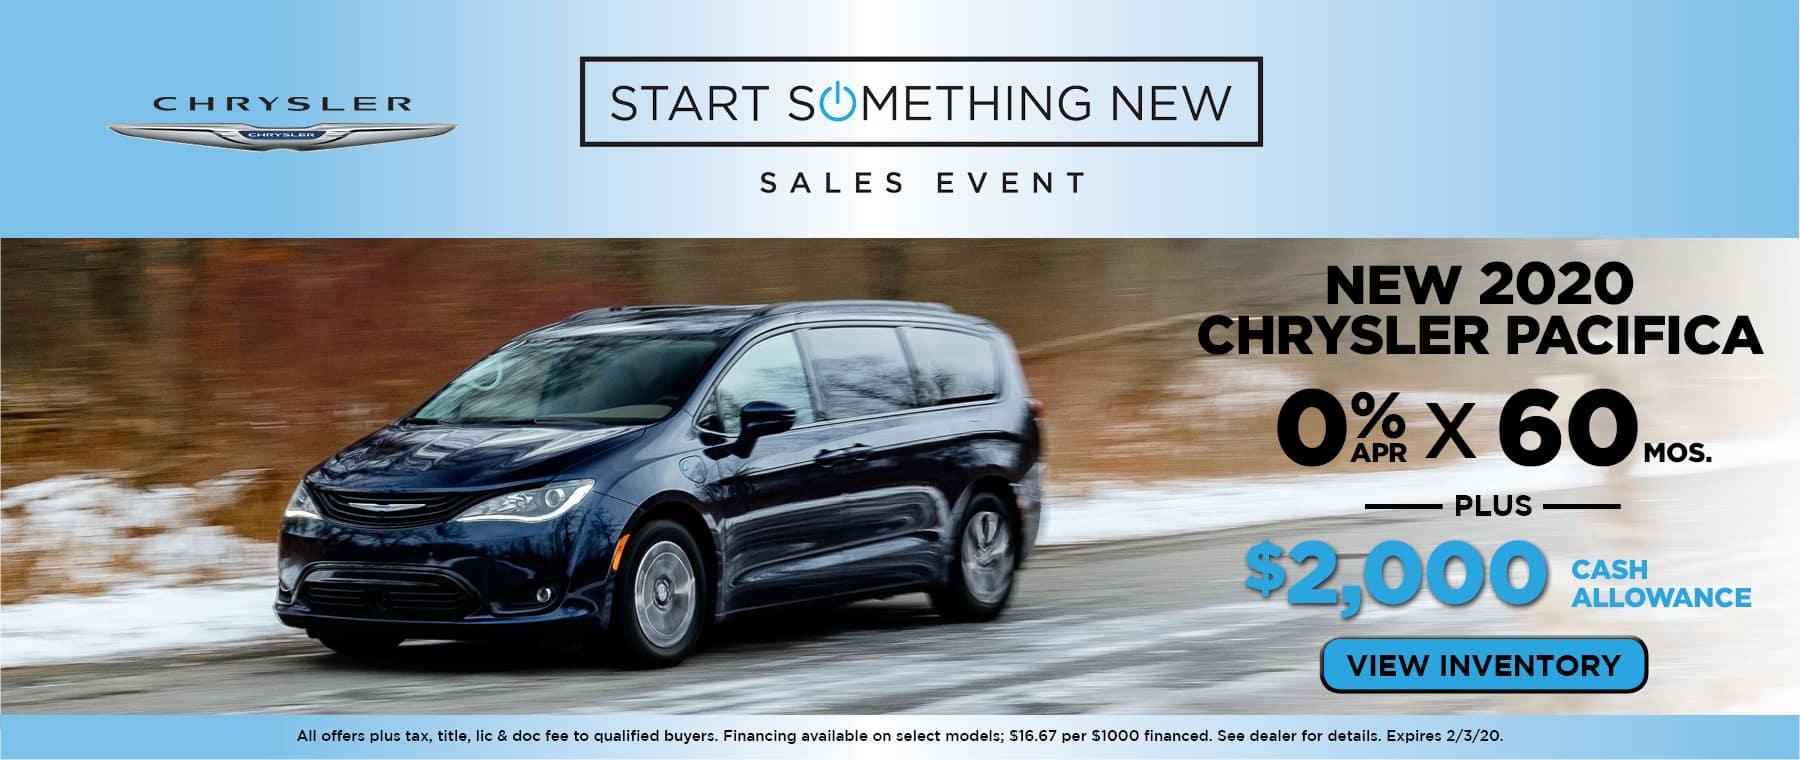 New 2020 Chrysler Pacifica